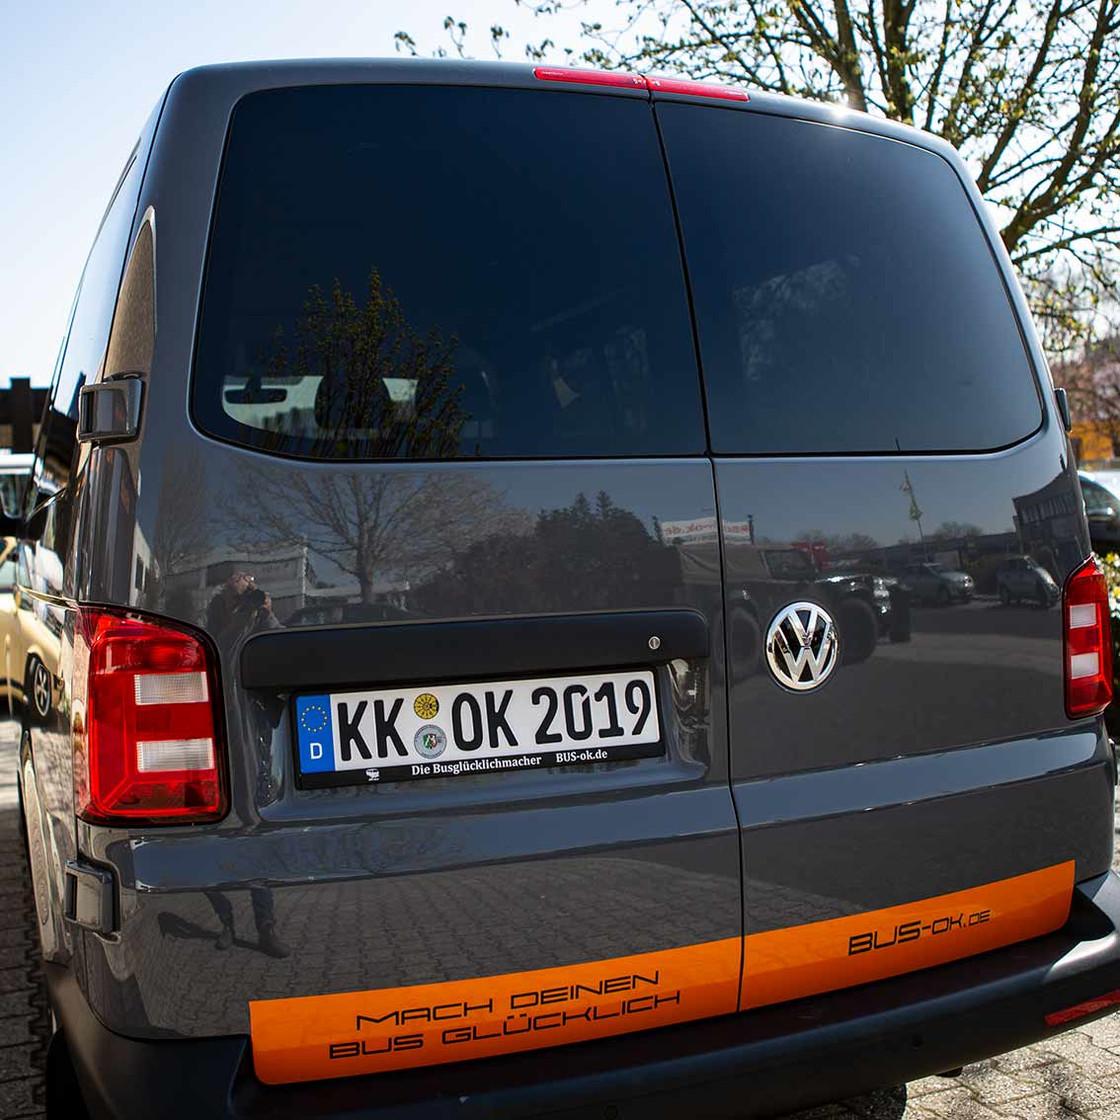 HECKLEUCHTE GLAS RÜCKLEUCHTENGLAS LINKS O RECHTS FÜR VW TRANSPORTER LL T2